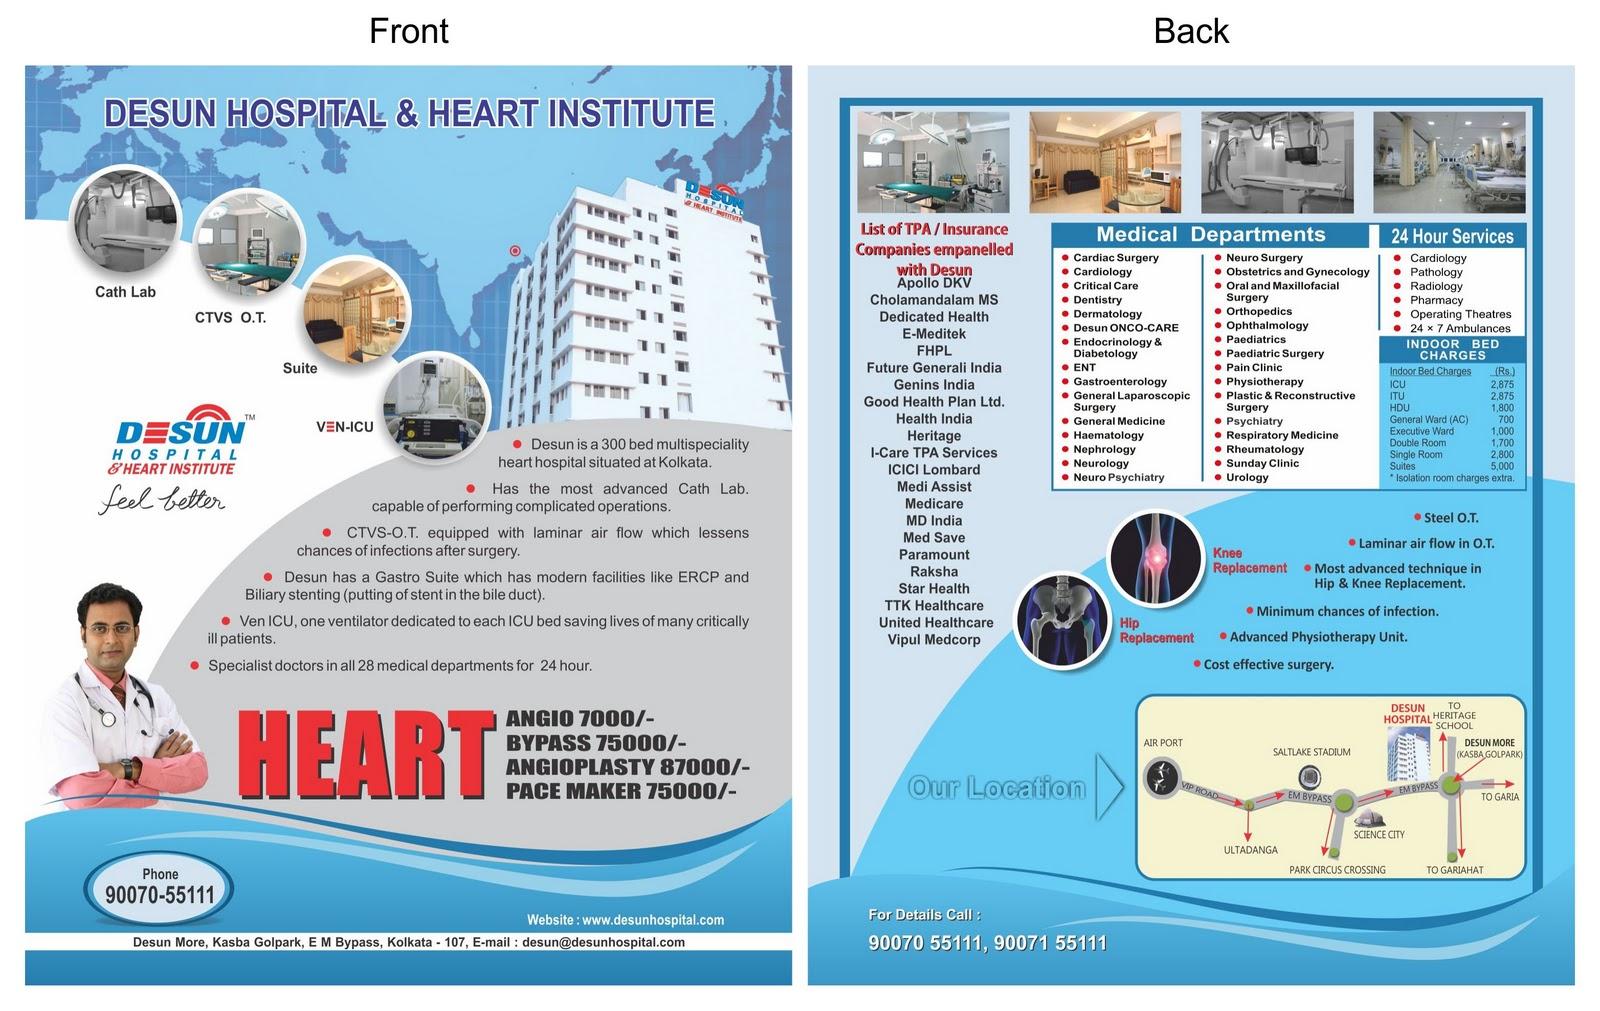 Gallery images and information: Travel Leaflet Design